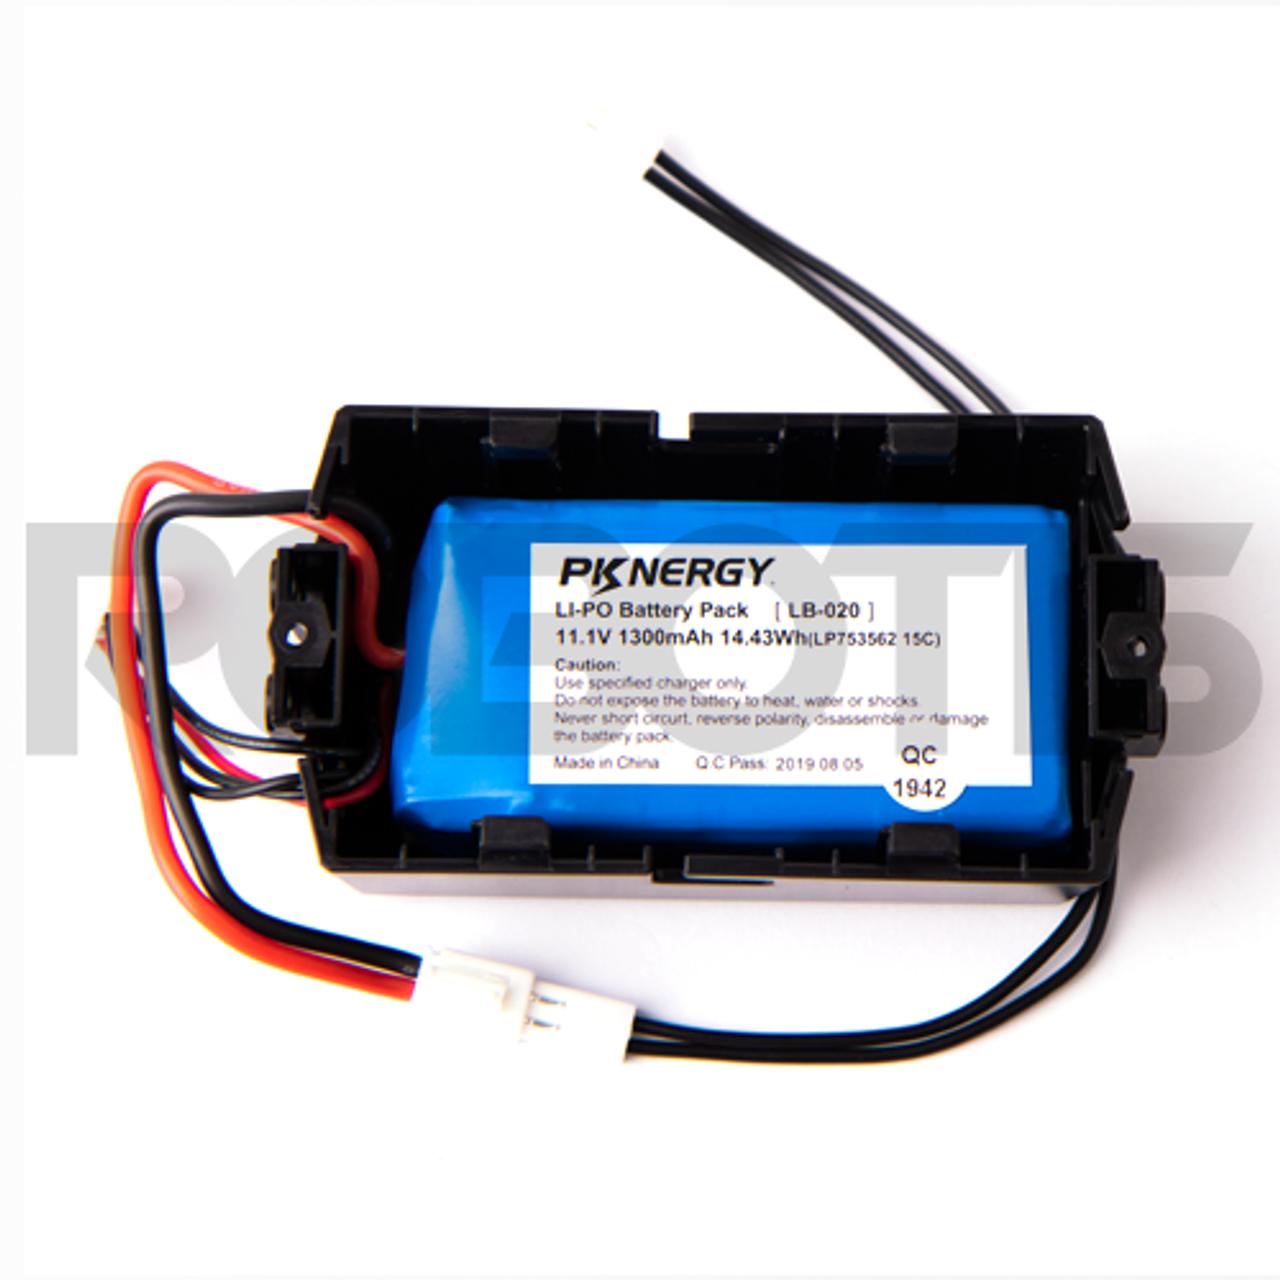 LIPO Battery 11.1V 1300mAh LB-020